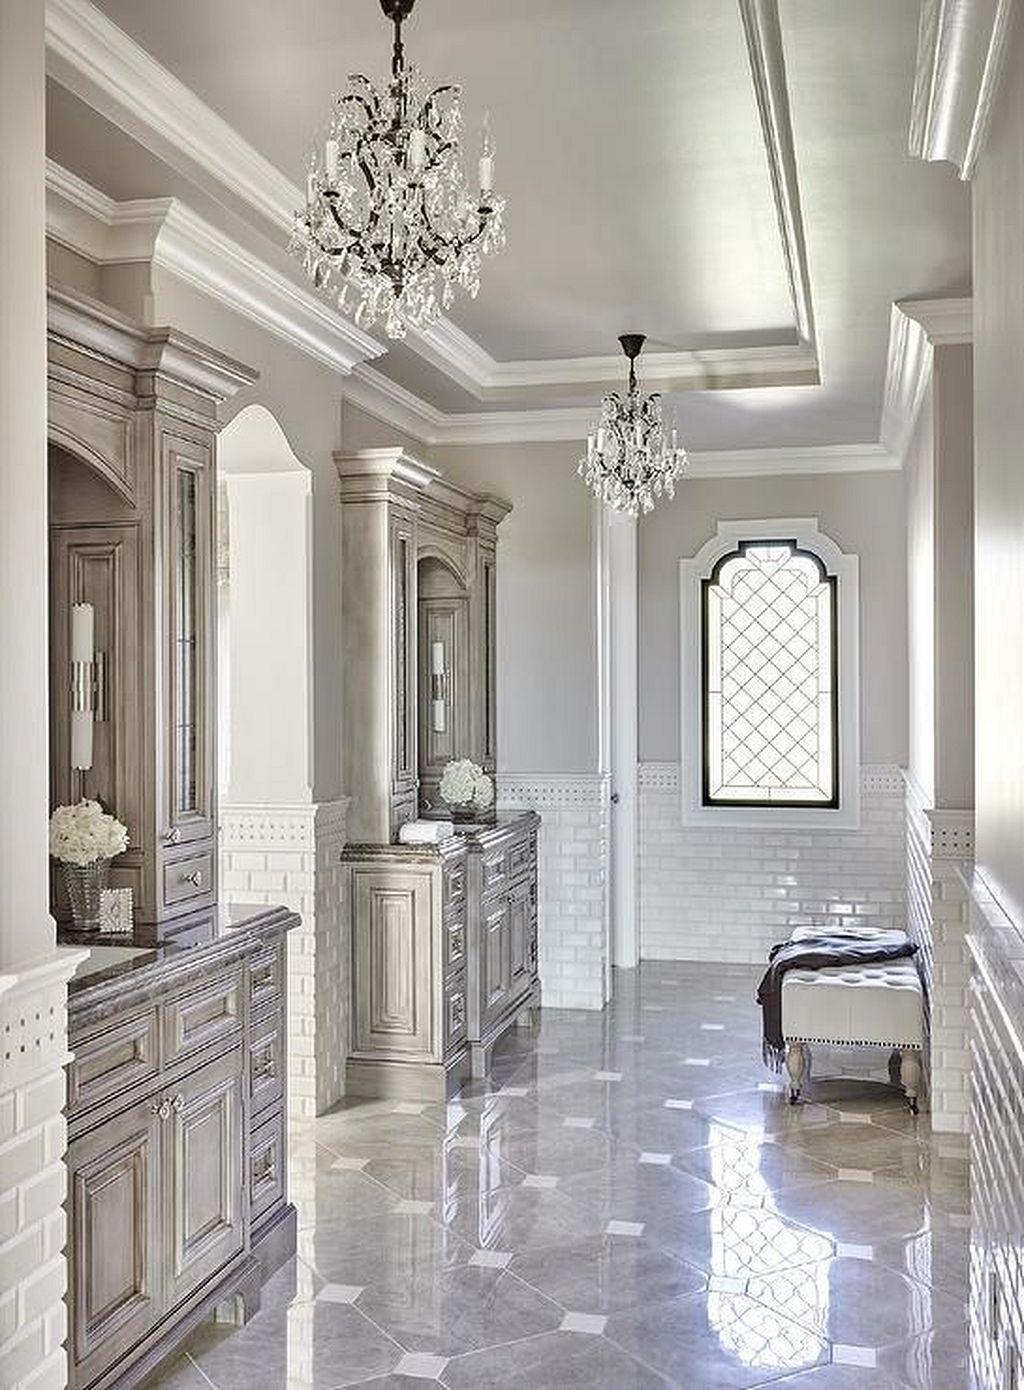 Luxurious Master Bathroom Design Ideas 72 | Master bathrooms ... on grey bathroom shower ideas, grey bathroom subway tile, grey bathroom mosaic tile, grey bathroom interior design, grey bathroom carpet, grey shower designs, grey tiled bathrooms, grey floor designs, grey italian tile bathroom, gray bathroom ideas interior designs, grey bathroom remodel ideas, grey wood tile bathroom, grey backsplash designs, grey stone flooring designs, grey ceramic floor tile, grey slate bathroom tile, grey masonry designs, grey bathroom tile colors, grey bathroom floor, grey hardwood flooring designs,